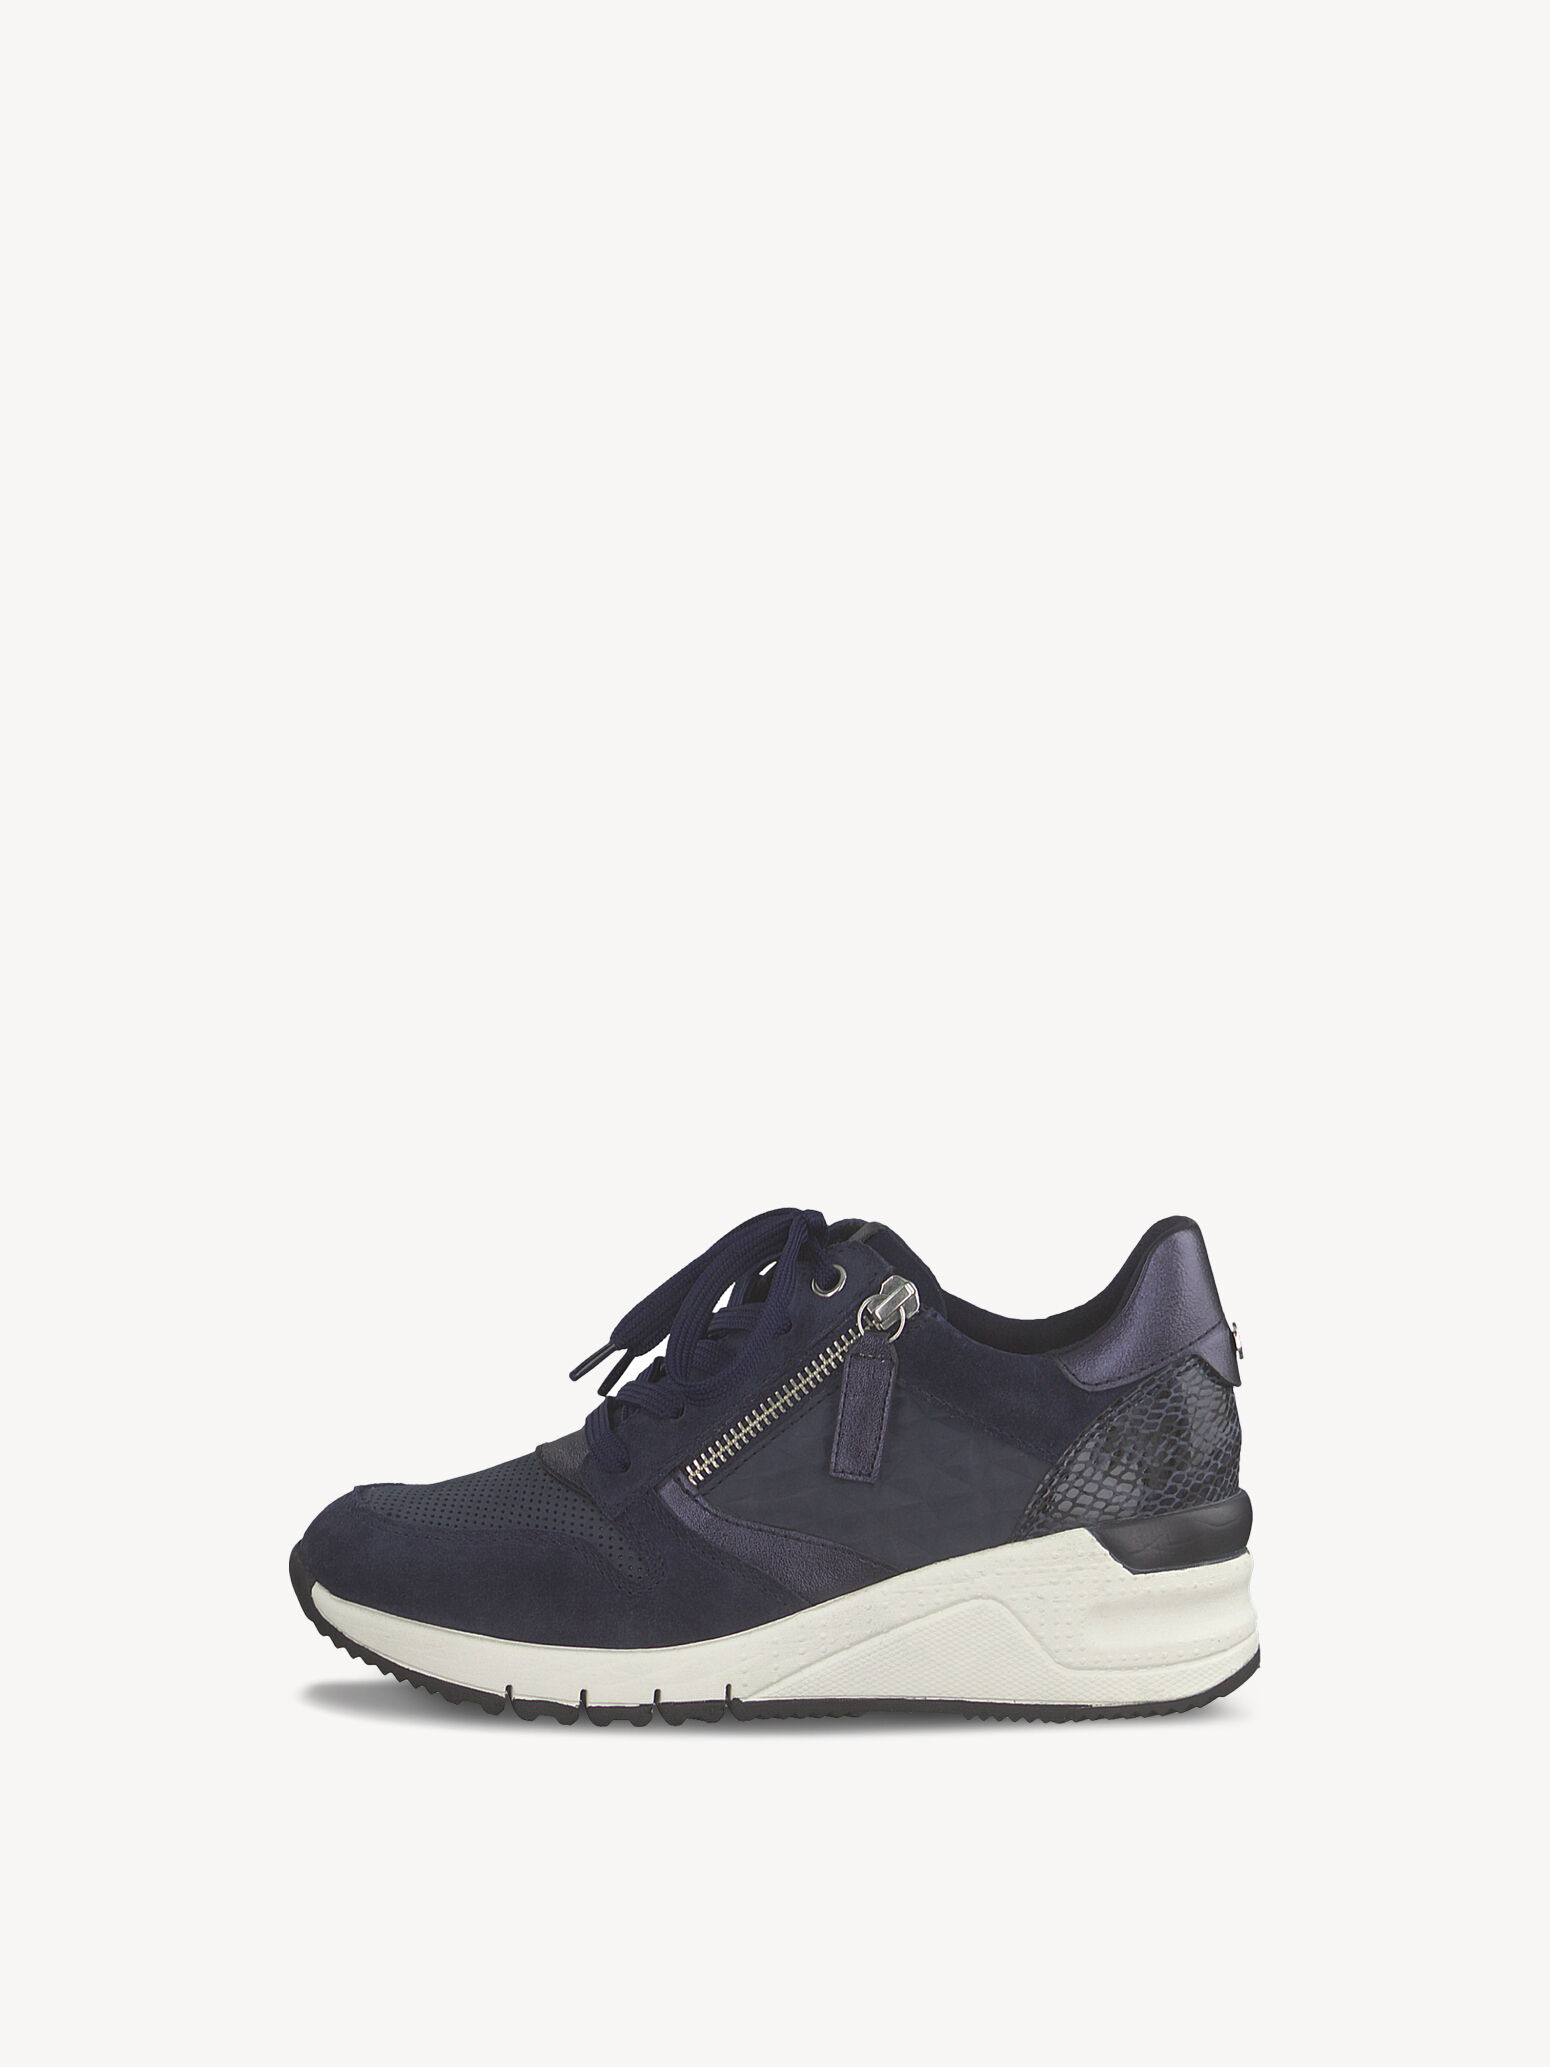 Ledersneaker blau 1 1 23702 24 890 42: Tamaris Sneaker